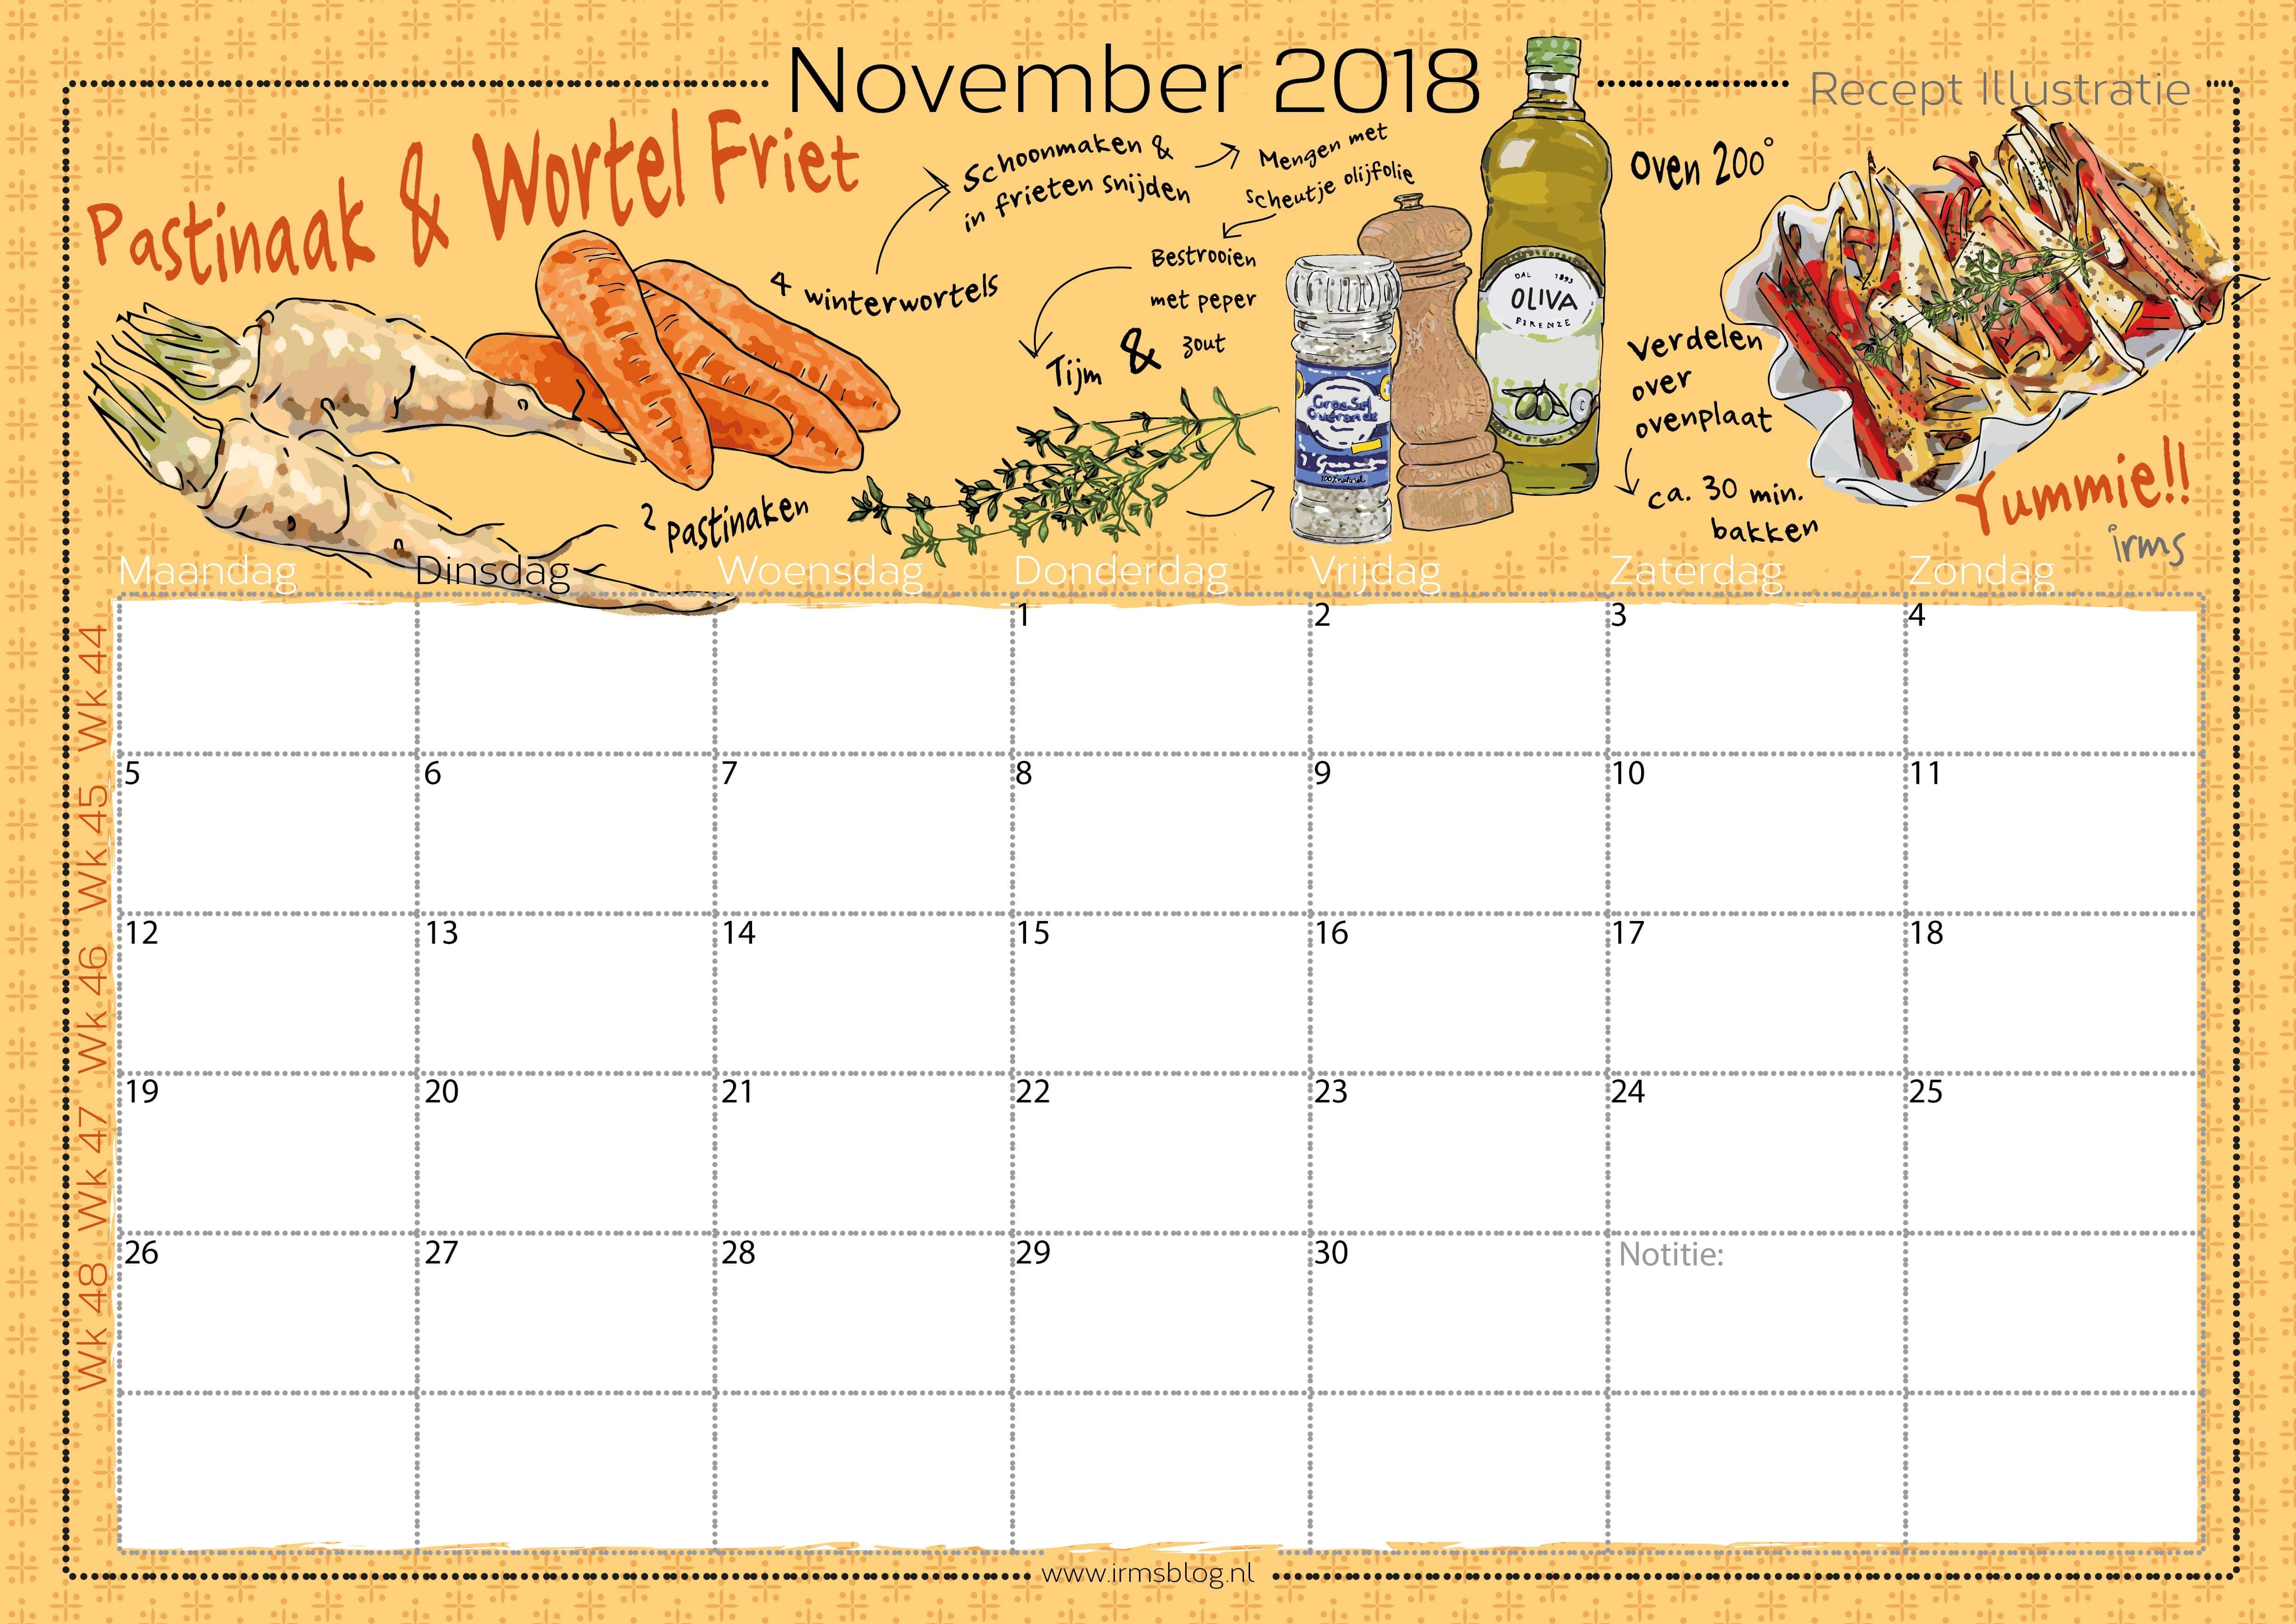 receptenkalender-2018-irmsblog_friet